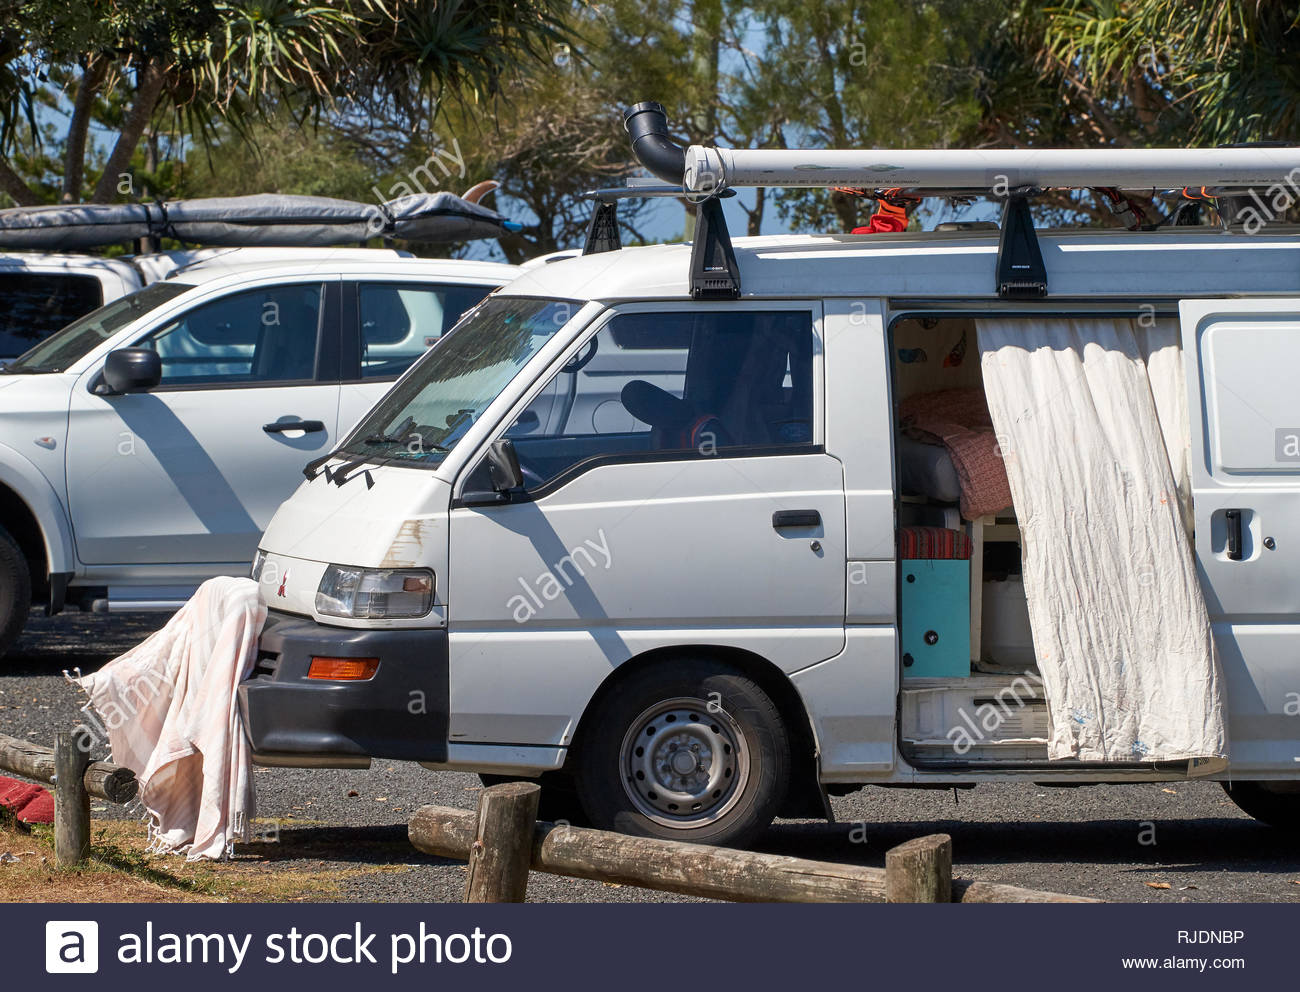 A small camper-van with it's side-door open, parked beside